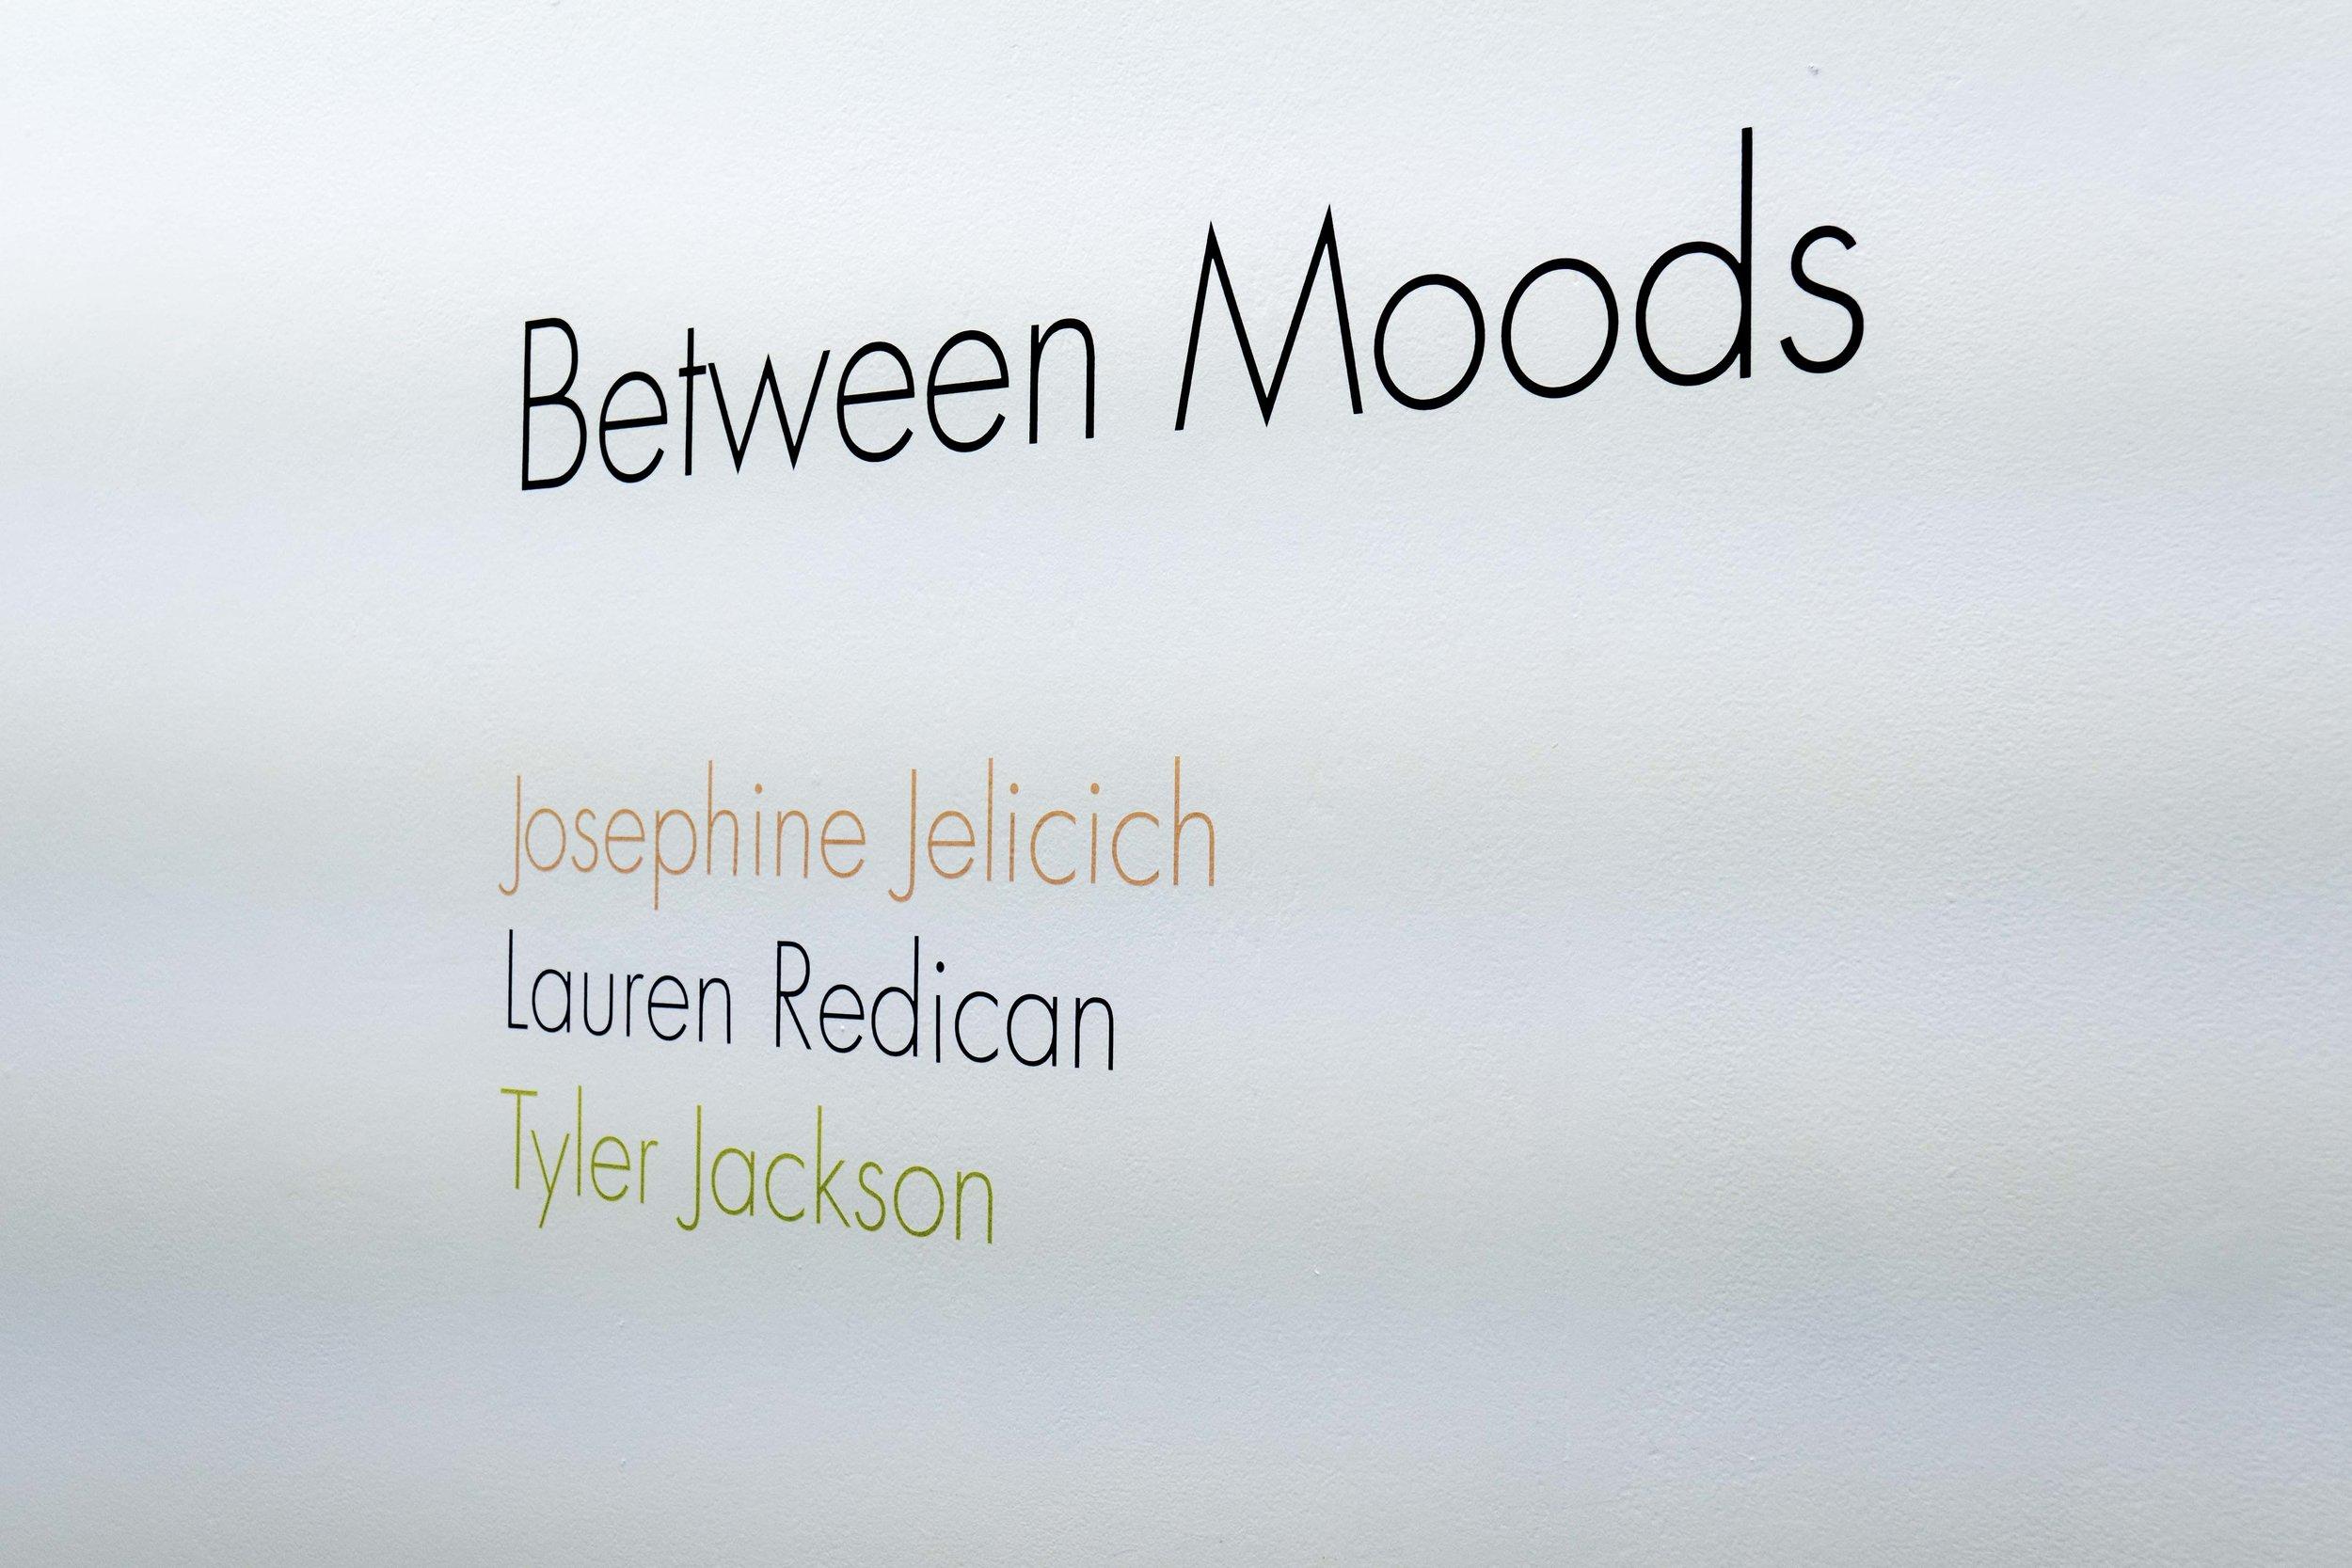 Between Moods Signage.jpg